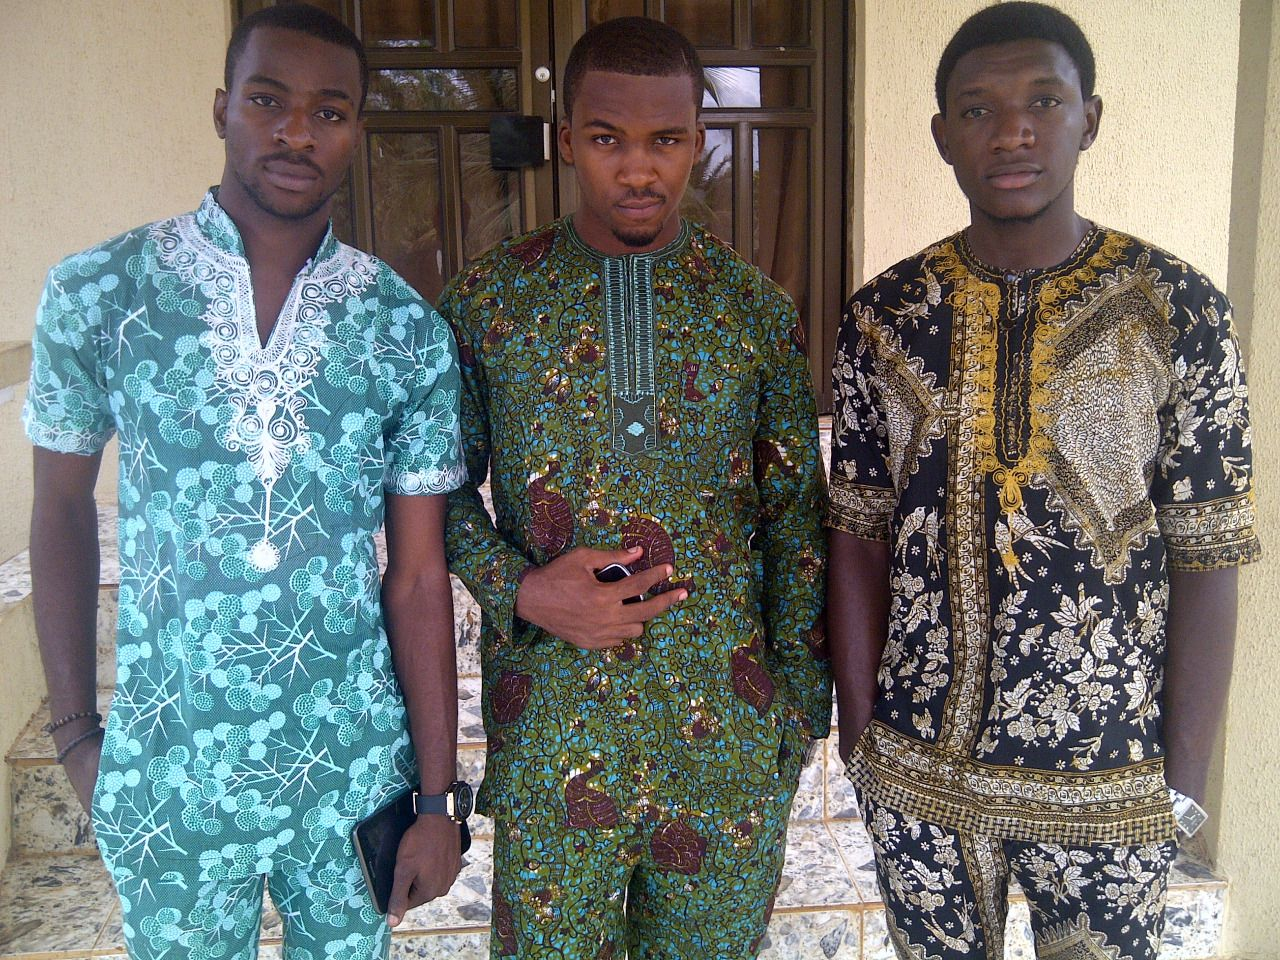 Shirt design in nigeria - Returnoftheblackking Africaisdonesuffering Custom Made Traditional Igbo Apparel Taken In Imo Nigeria